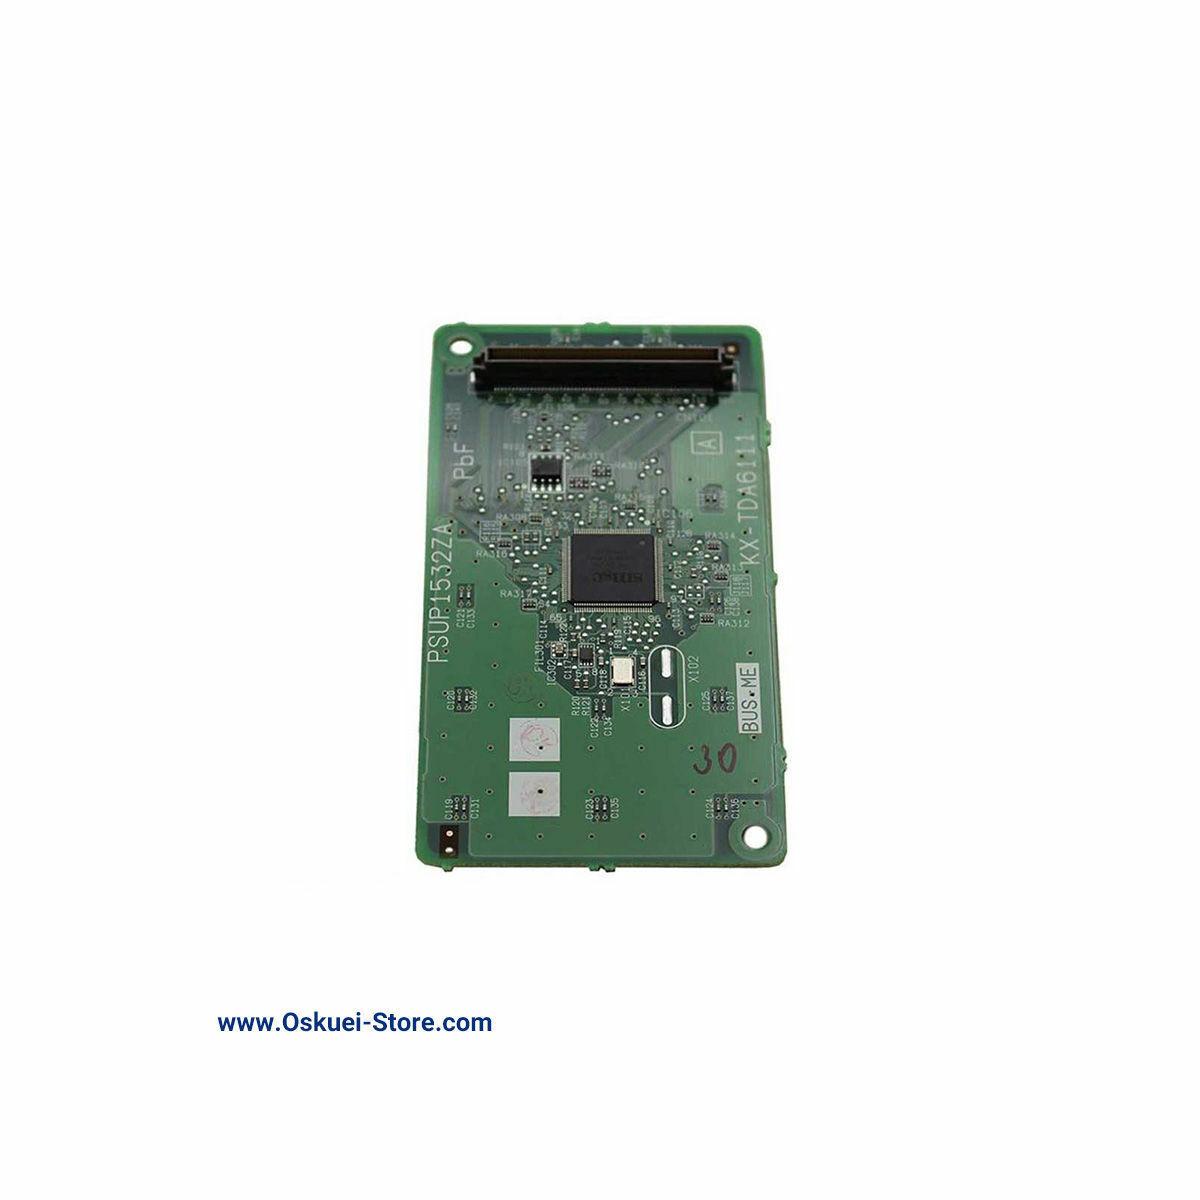 KX-TDA6111